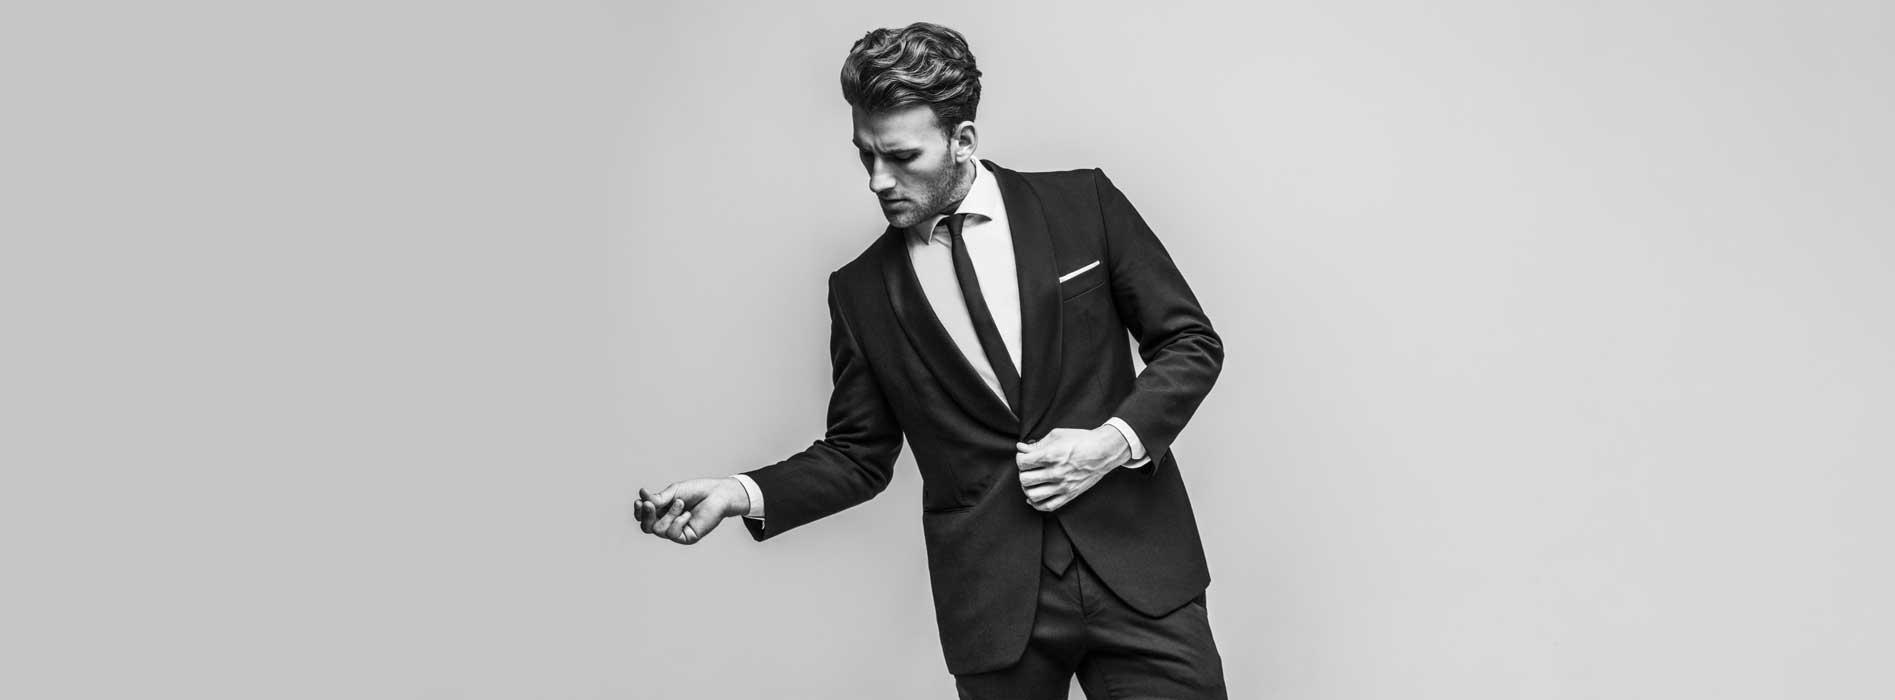 Stylish Man In Men's Fashion Dress